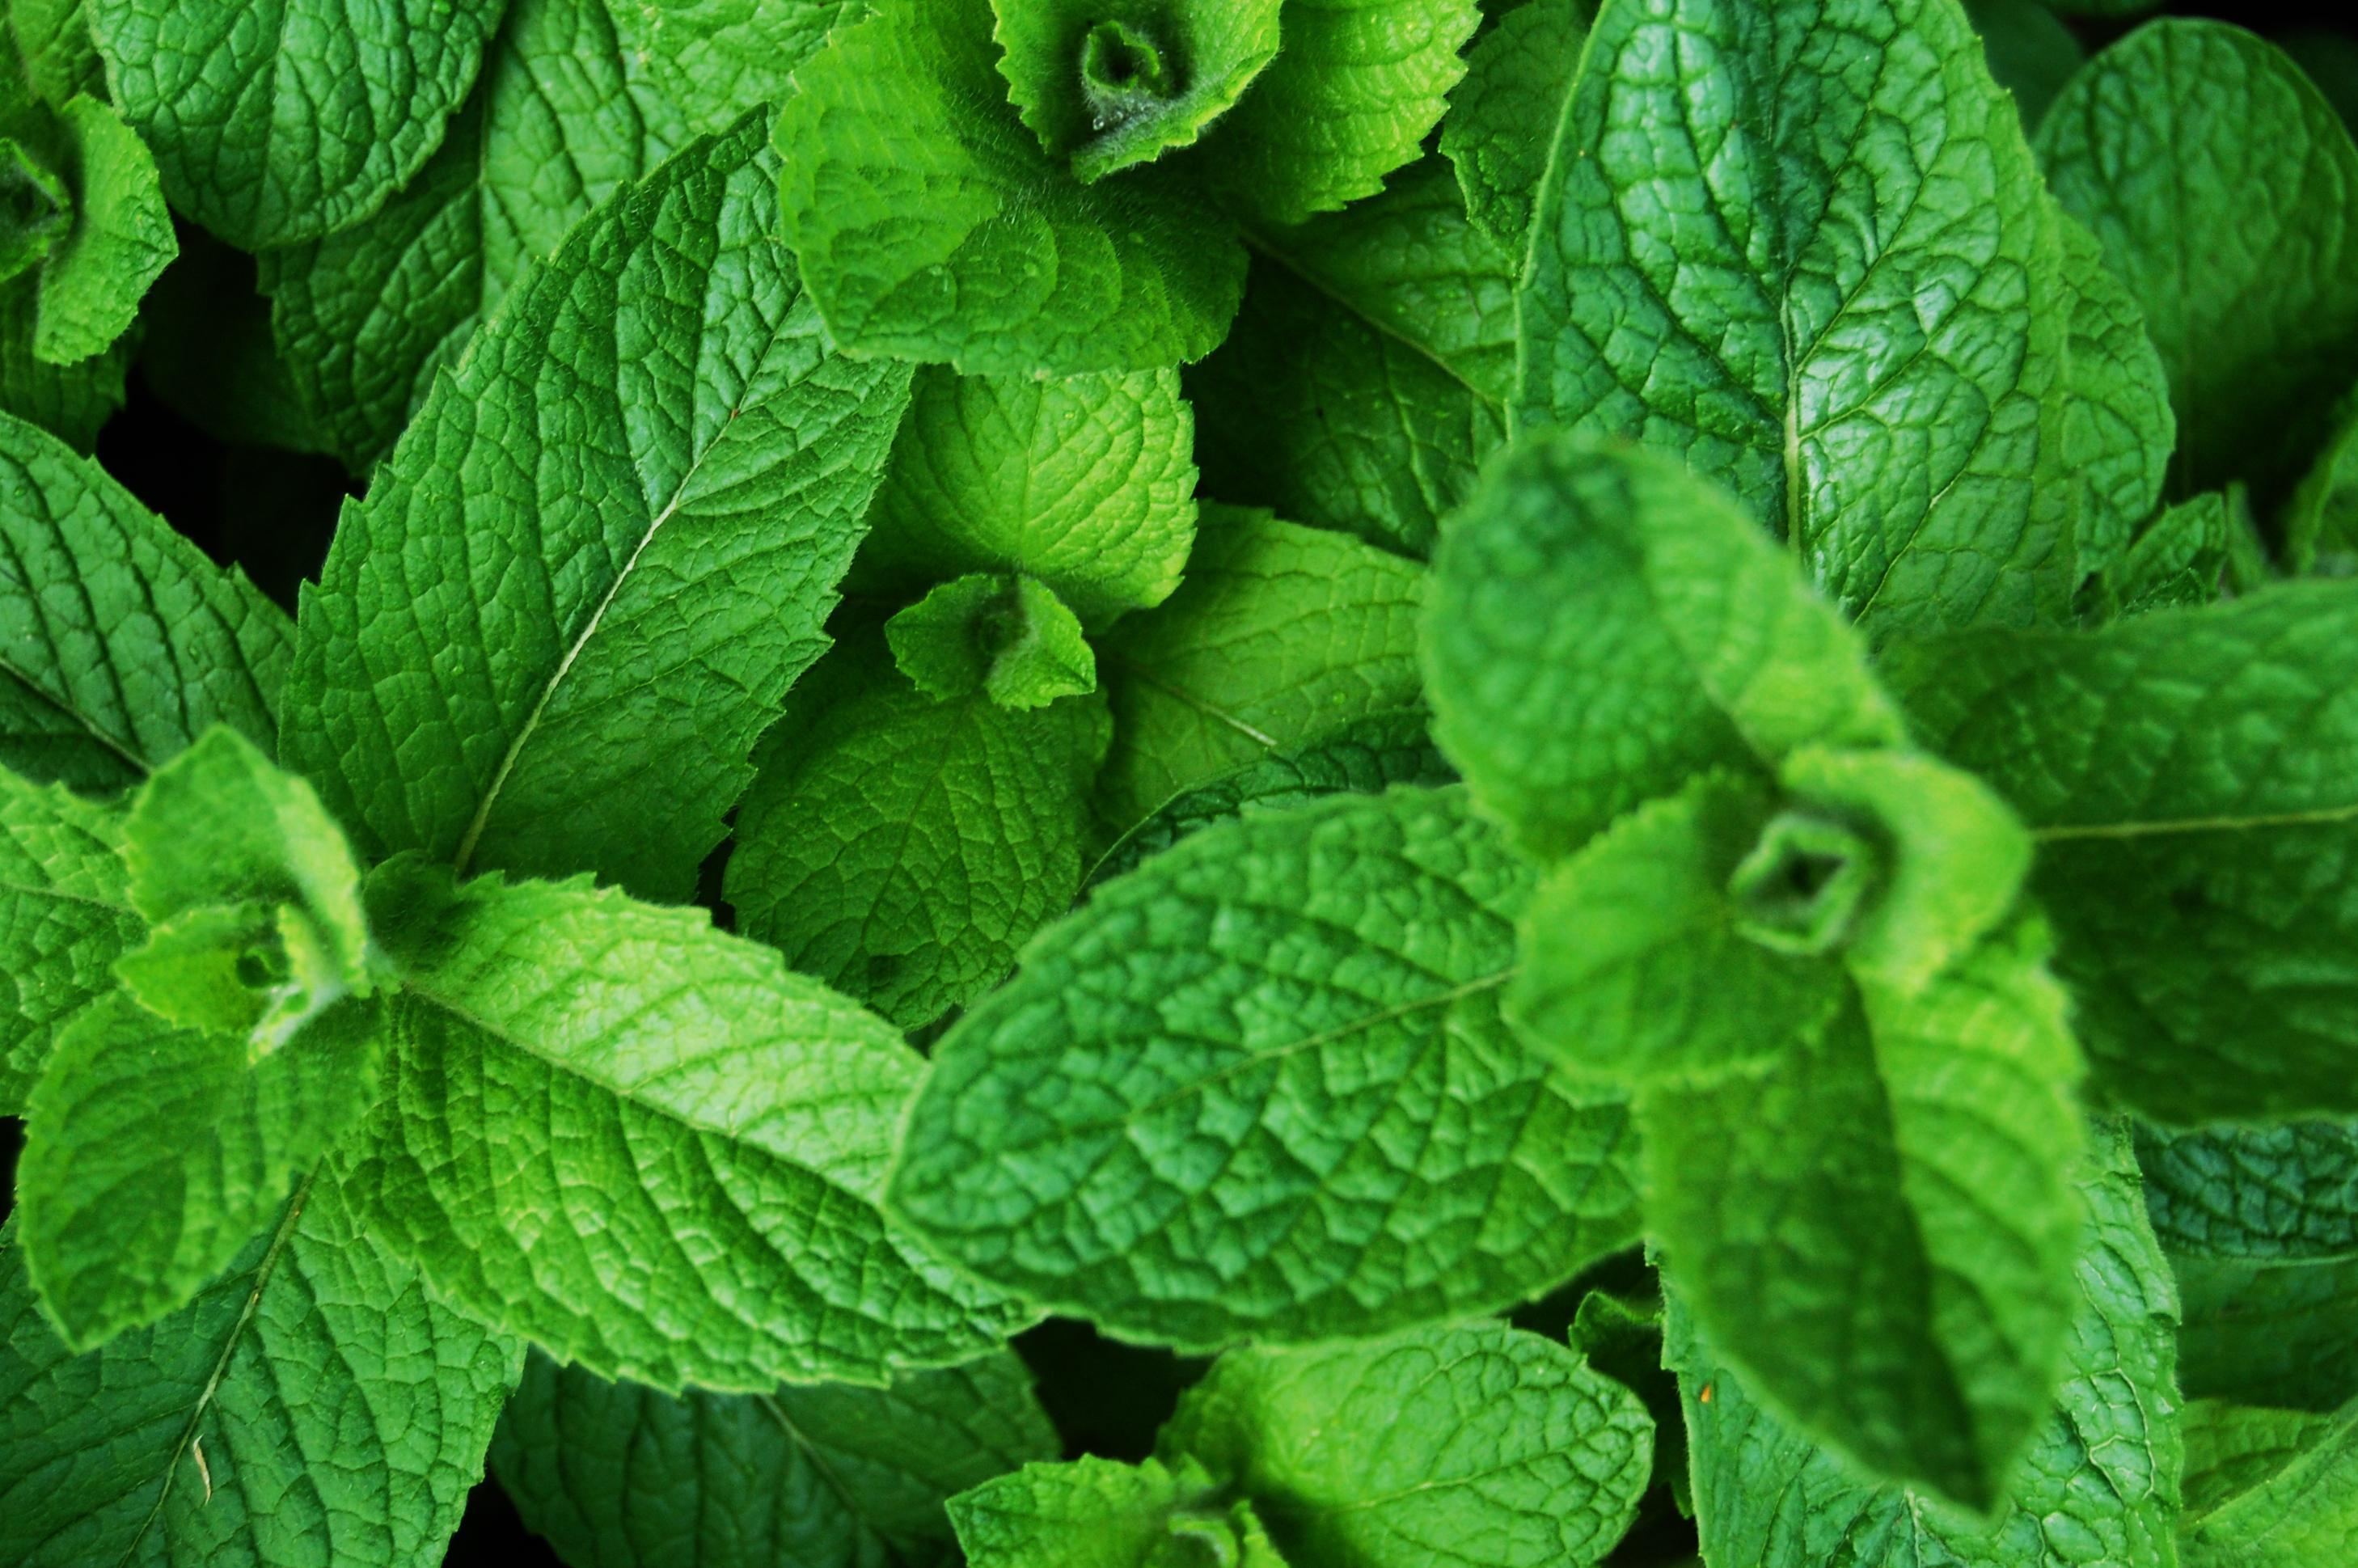 Planta medicinal – Hortelã rasteira